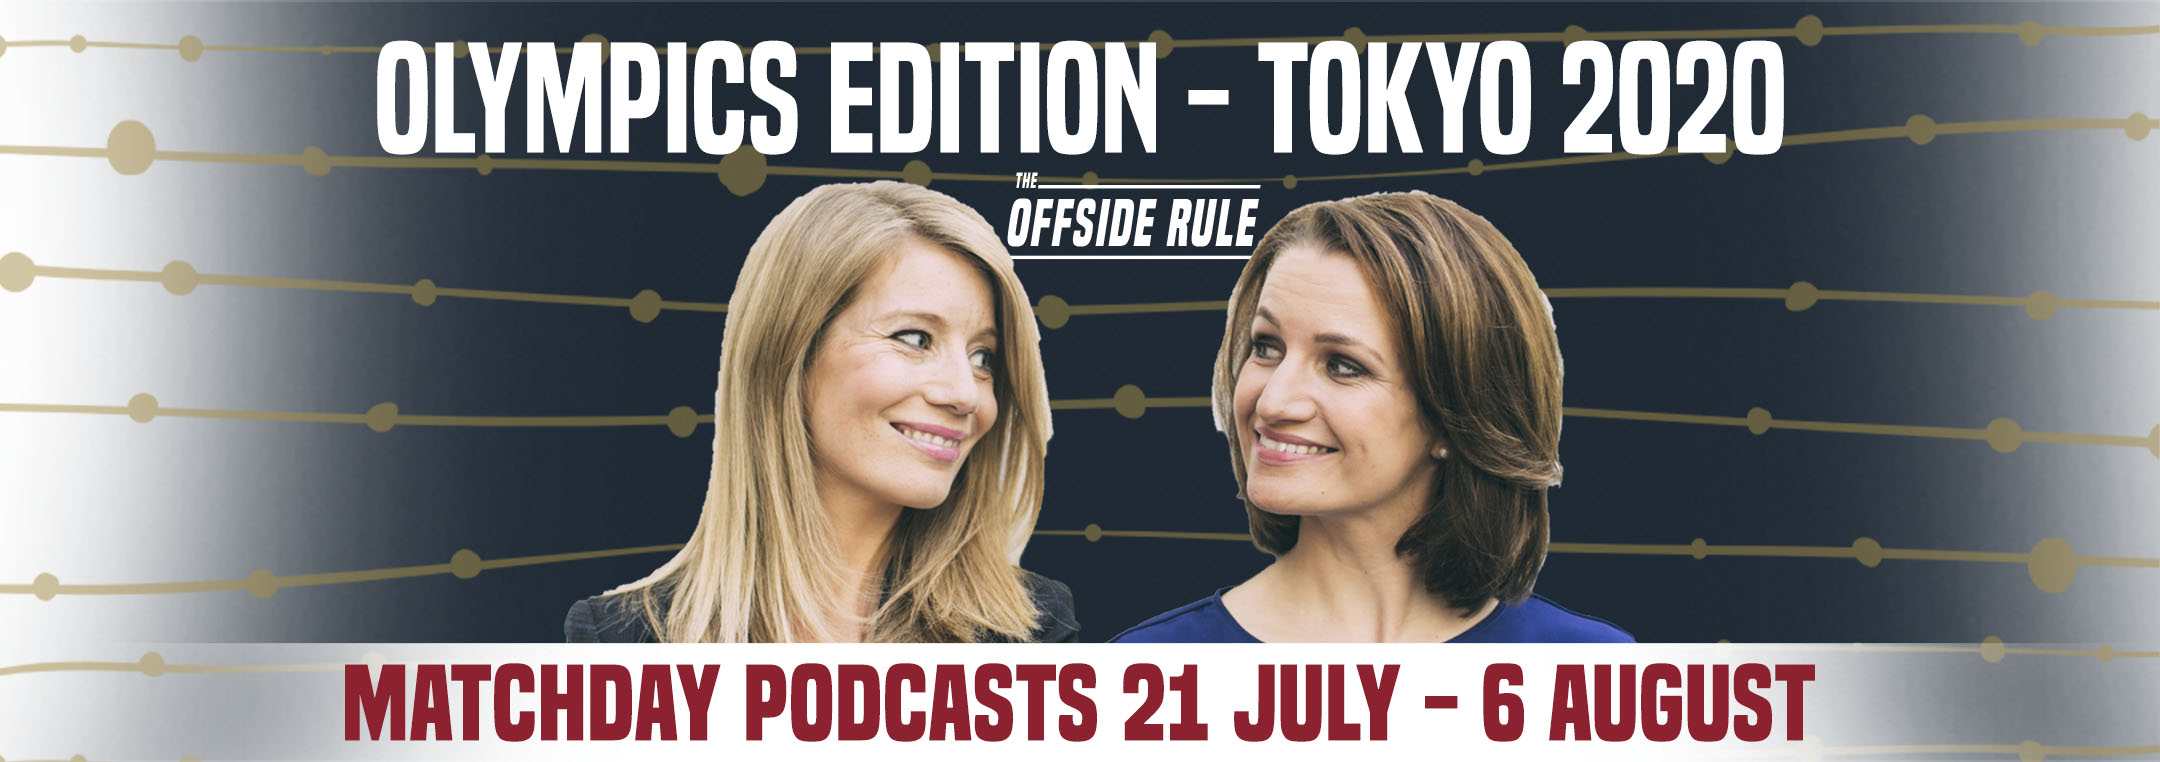 Olympics Edition - Tokyo 2020